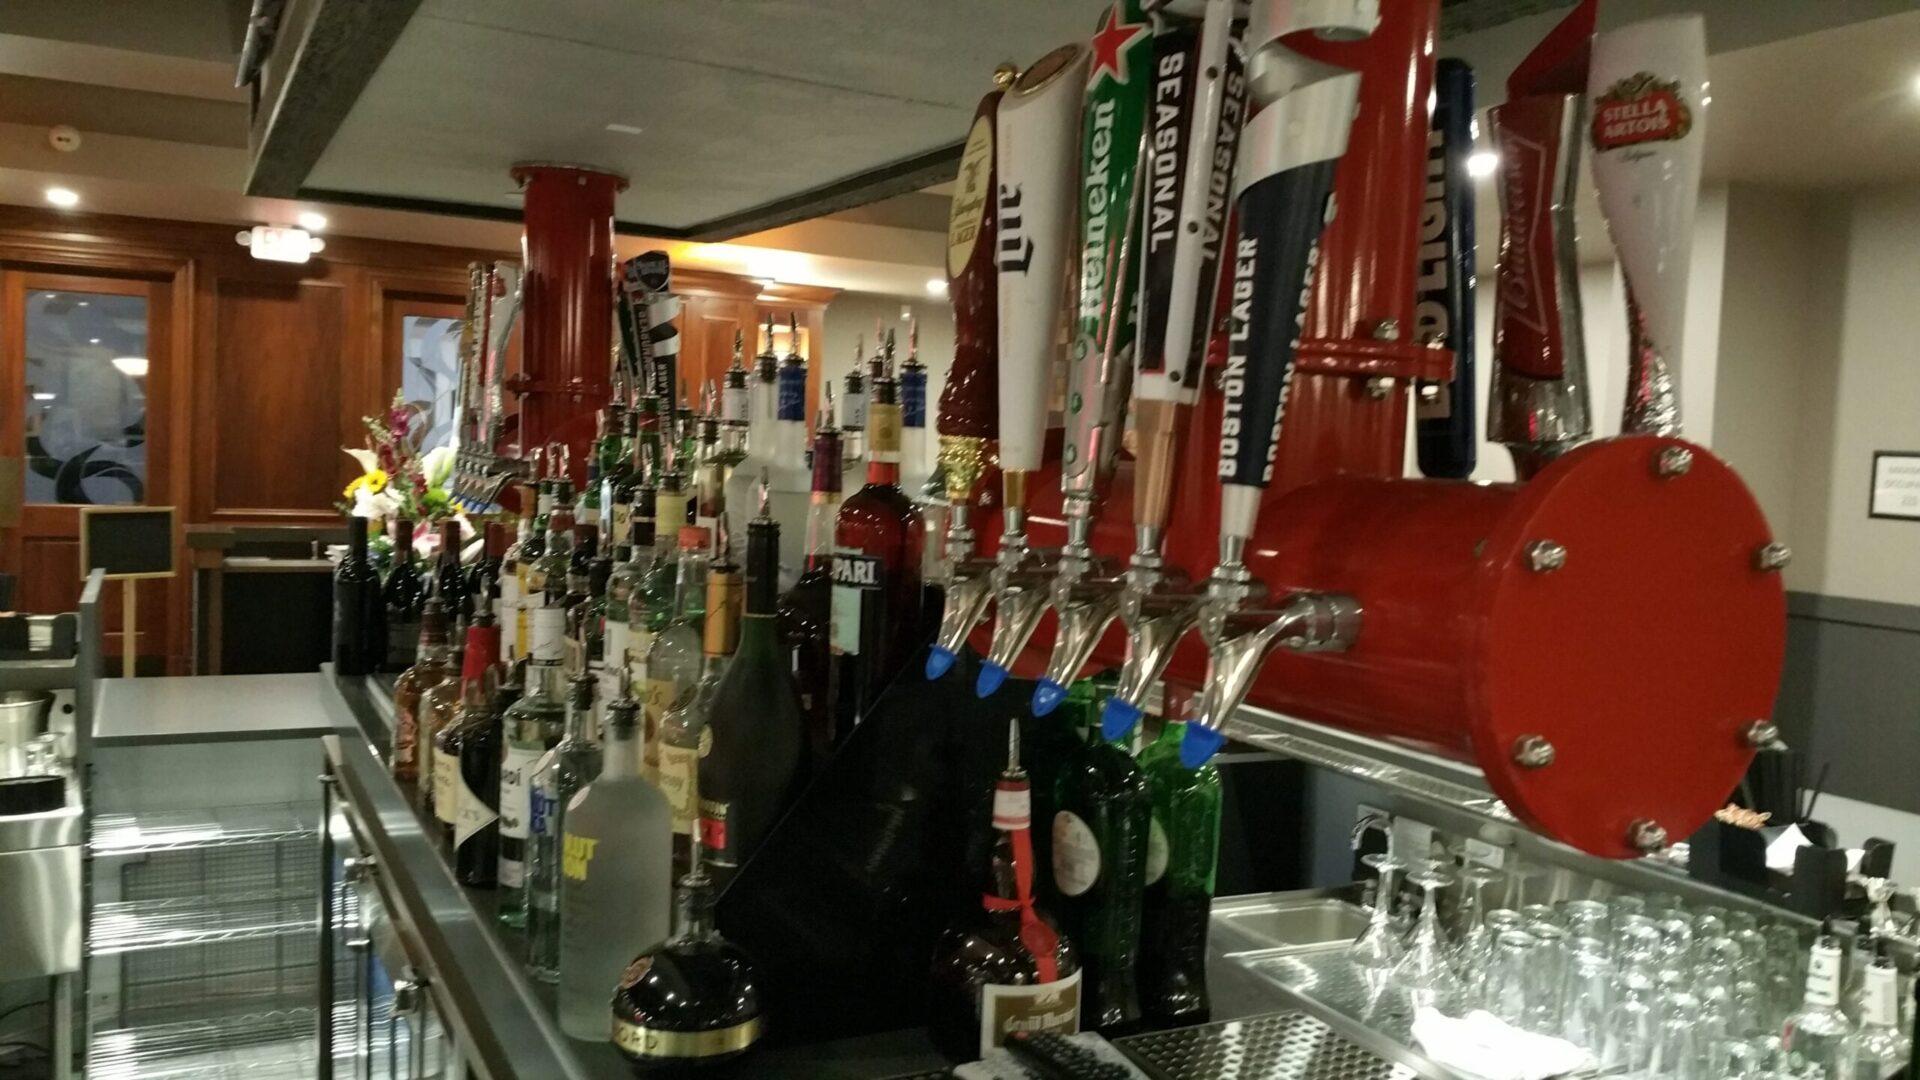 Bar equipment at Tony Roma's West Palm Beach